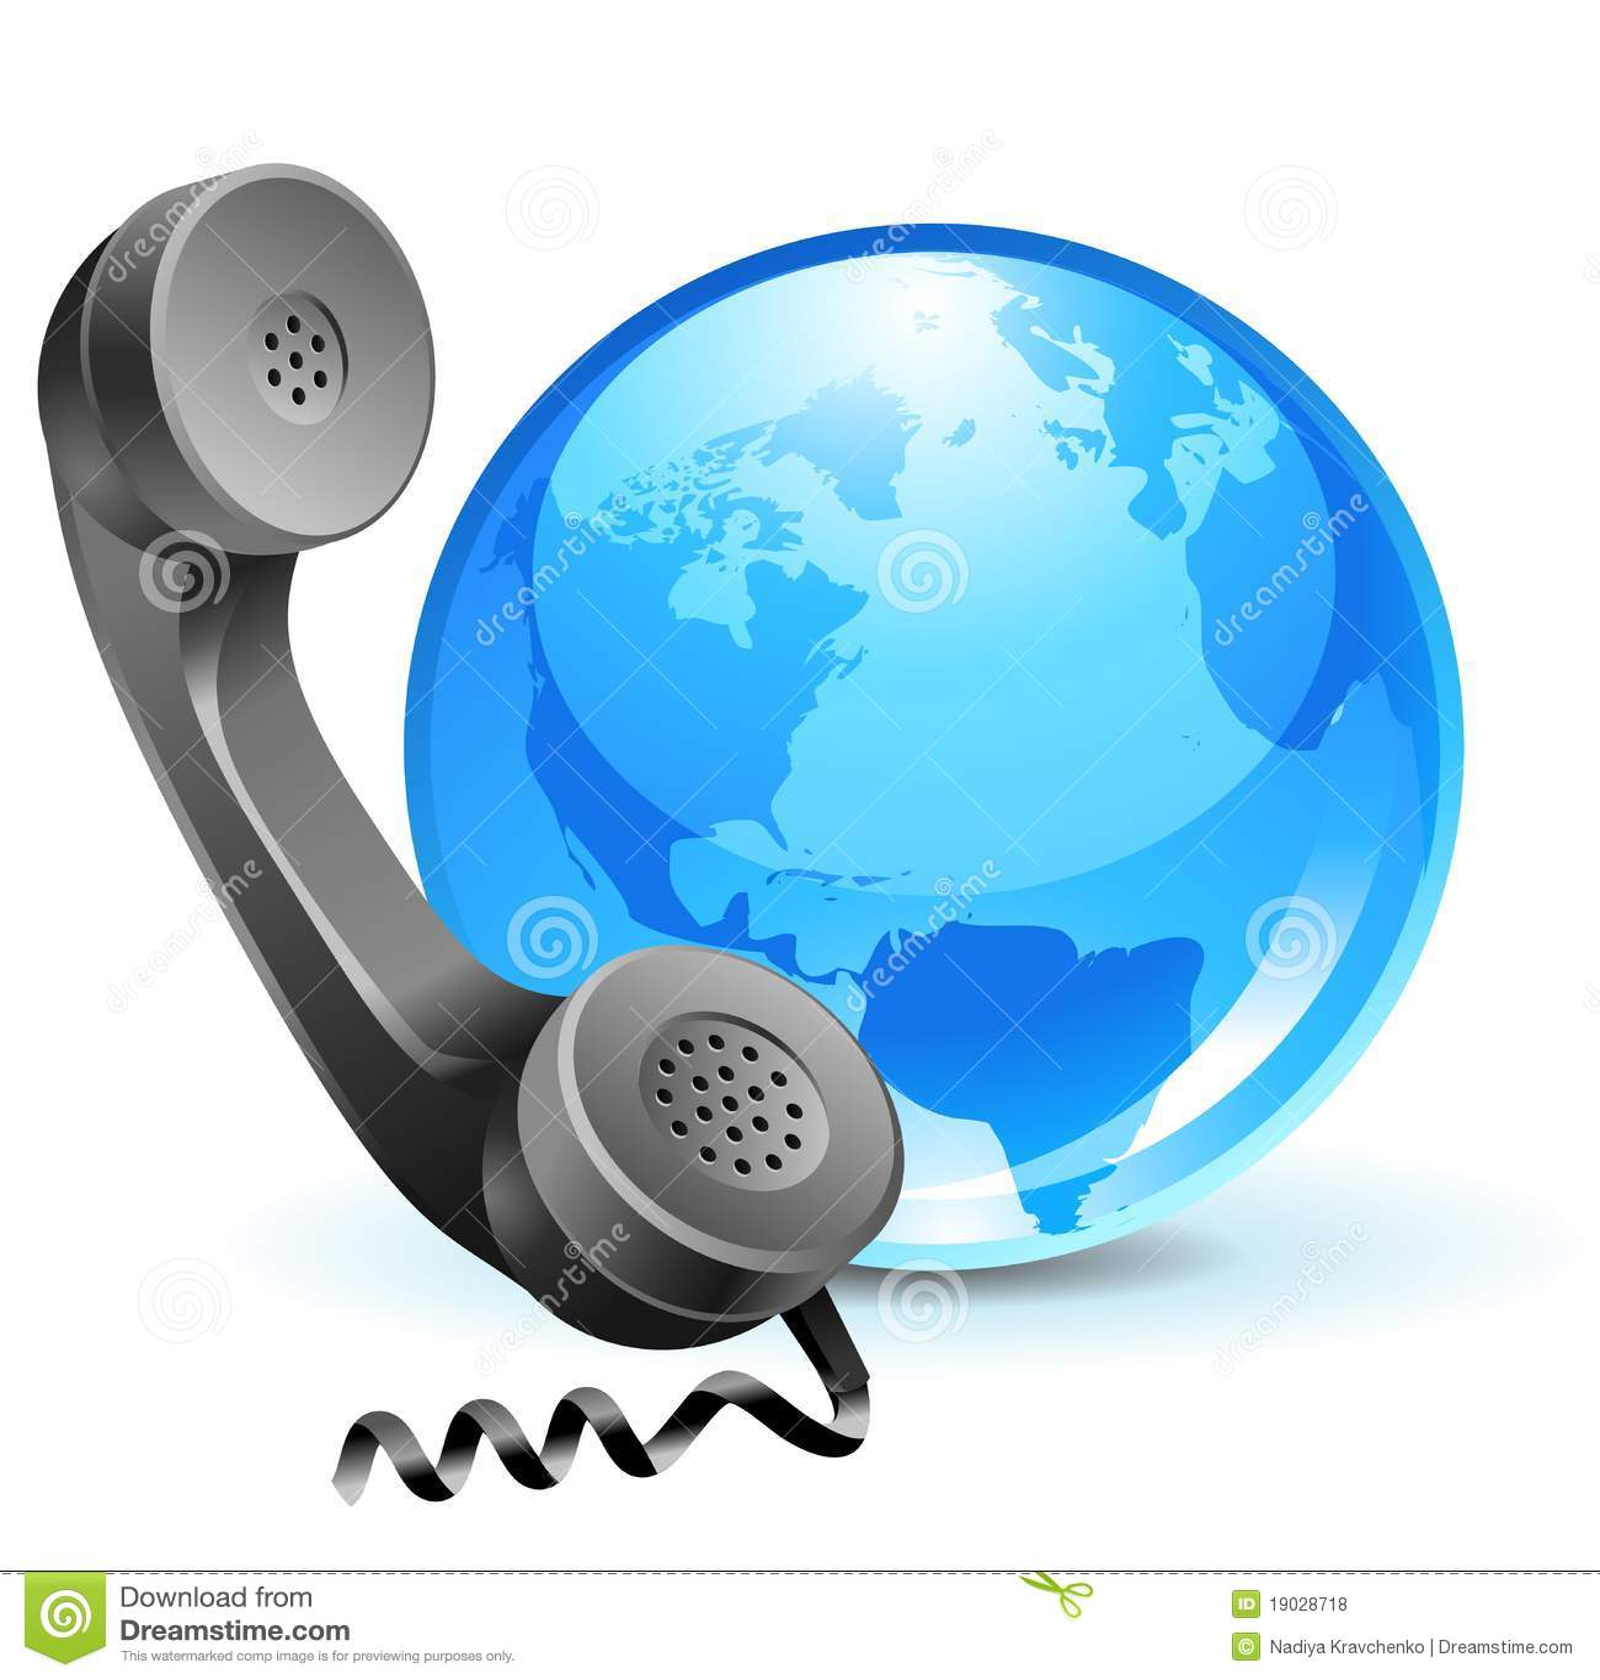 Teléfono-globo (1).jpg